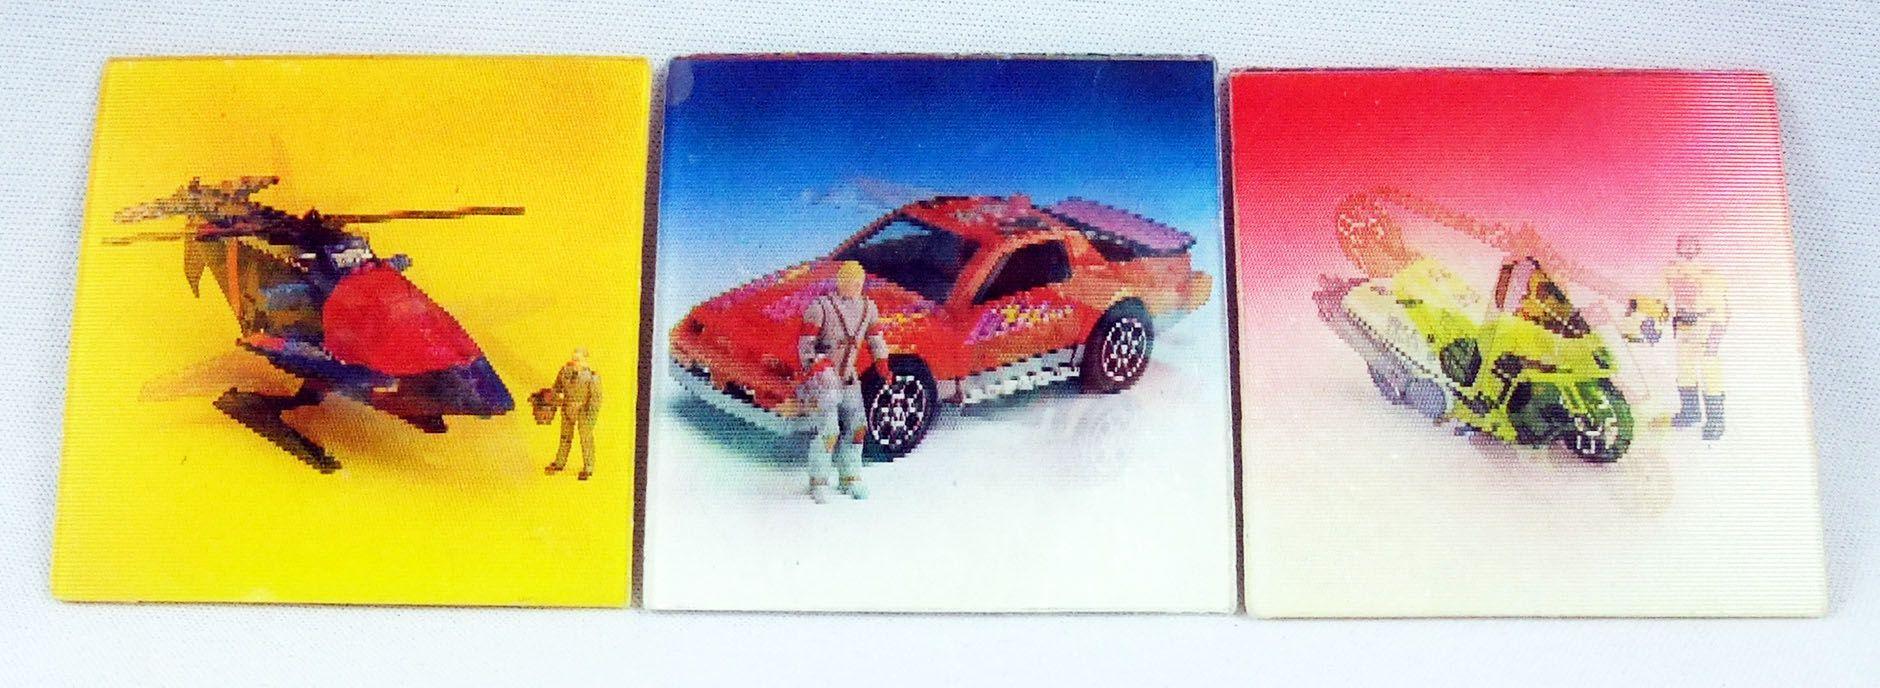 M.A.S.K. - Set de 3 images lenticulaires promotionelles : Switchblade, Thunderhawk, Condor - Kenner